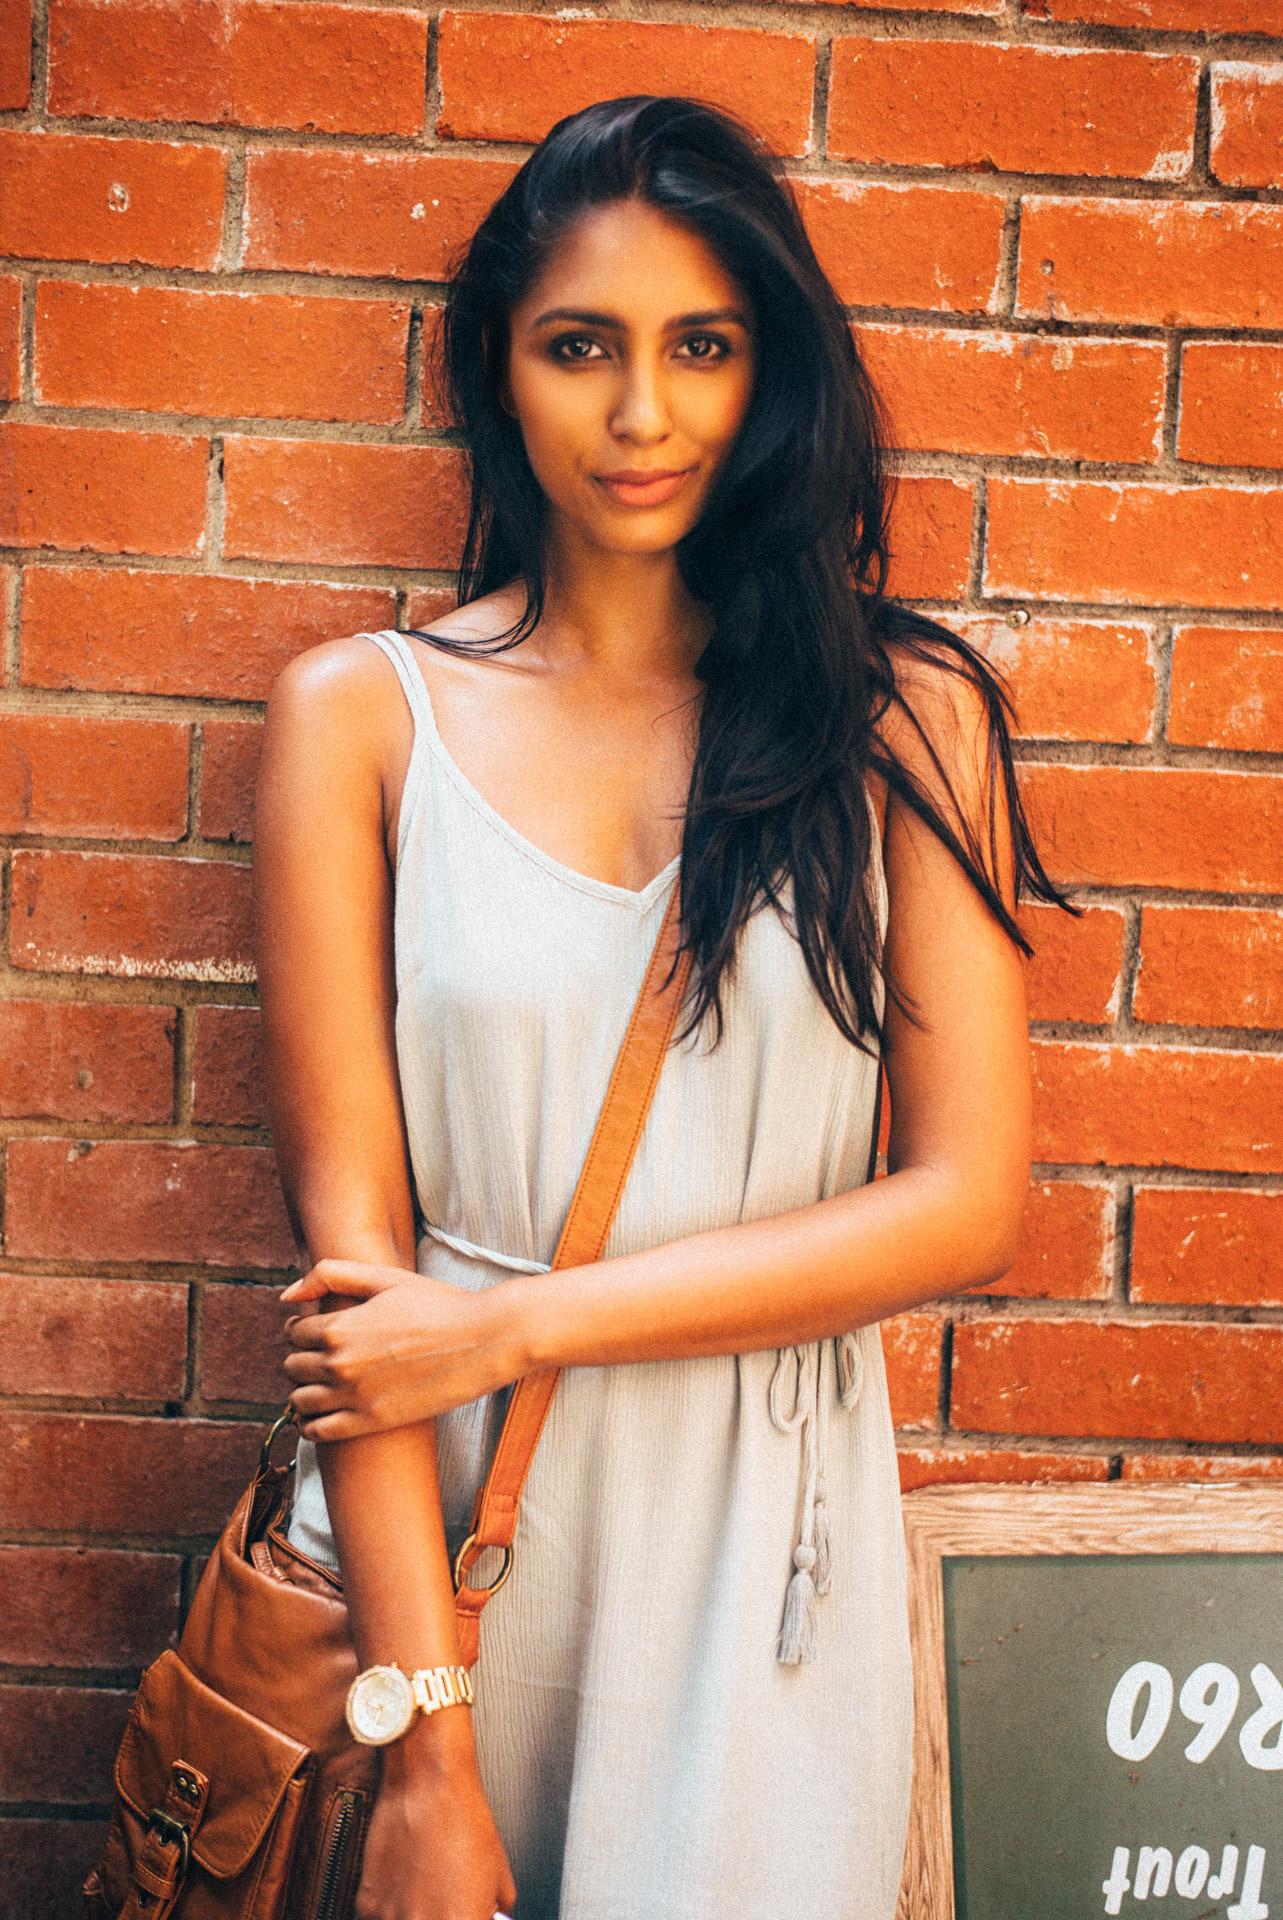 Priyanka Moodley-1003657-Bearbeitet.jpg